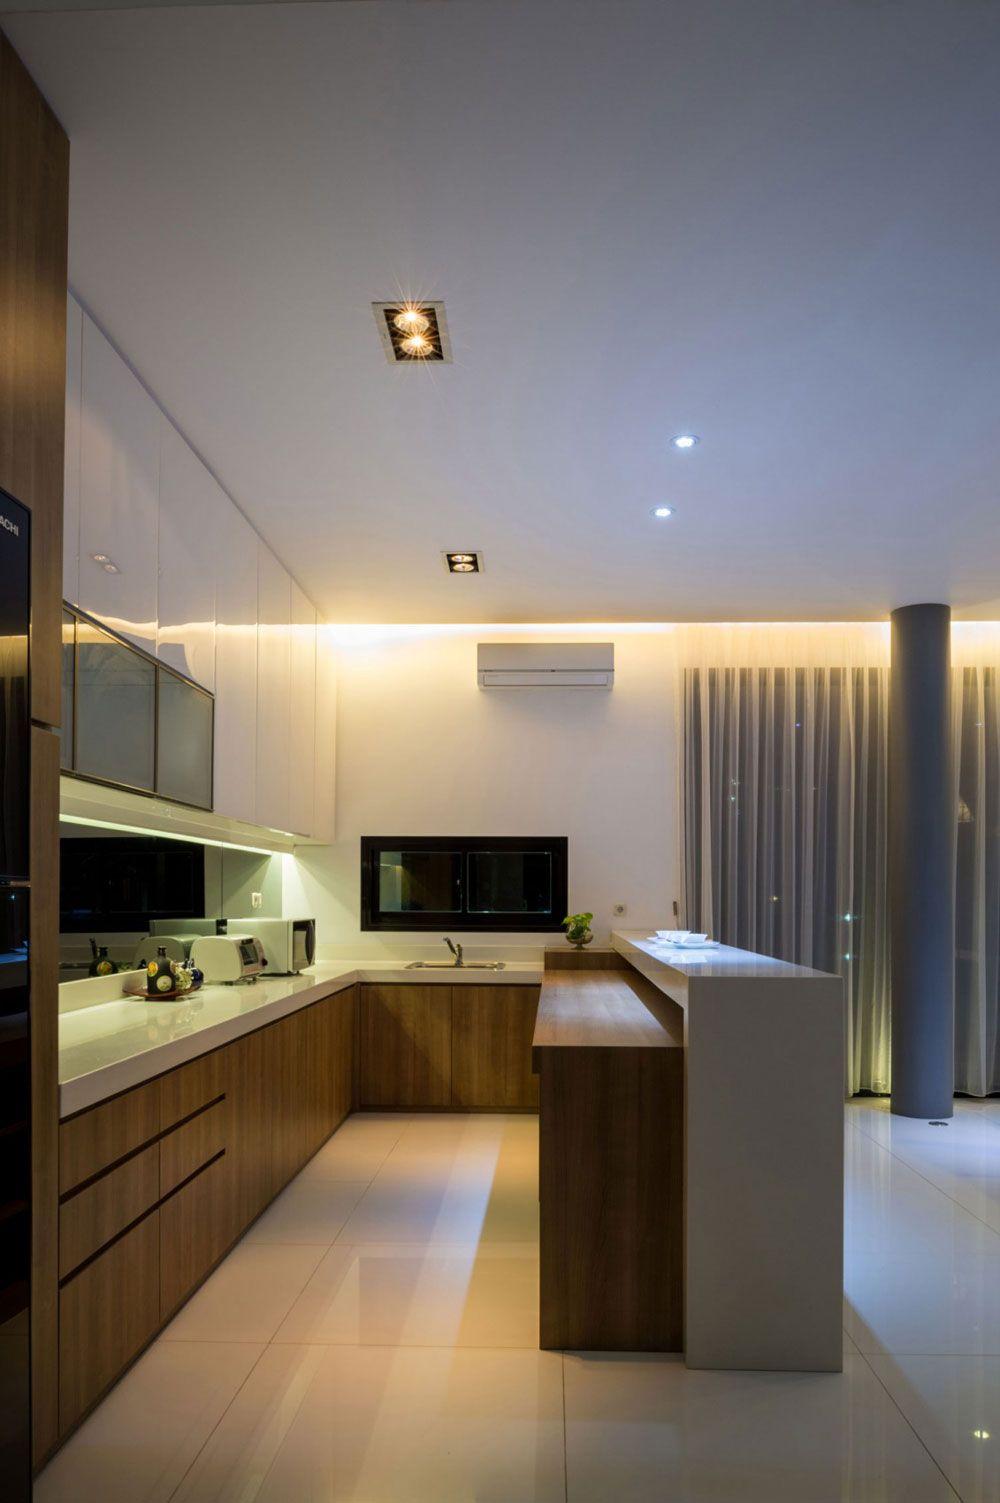 Kitchen Interior Design For Flats To Create The Perfect Kitchen Best Kitchen Design For Flats Inspiration Design